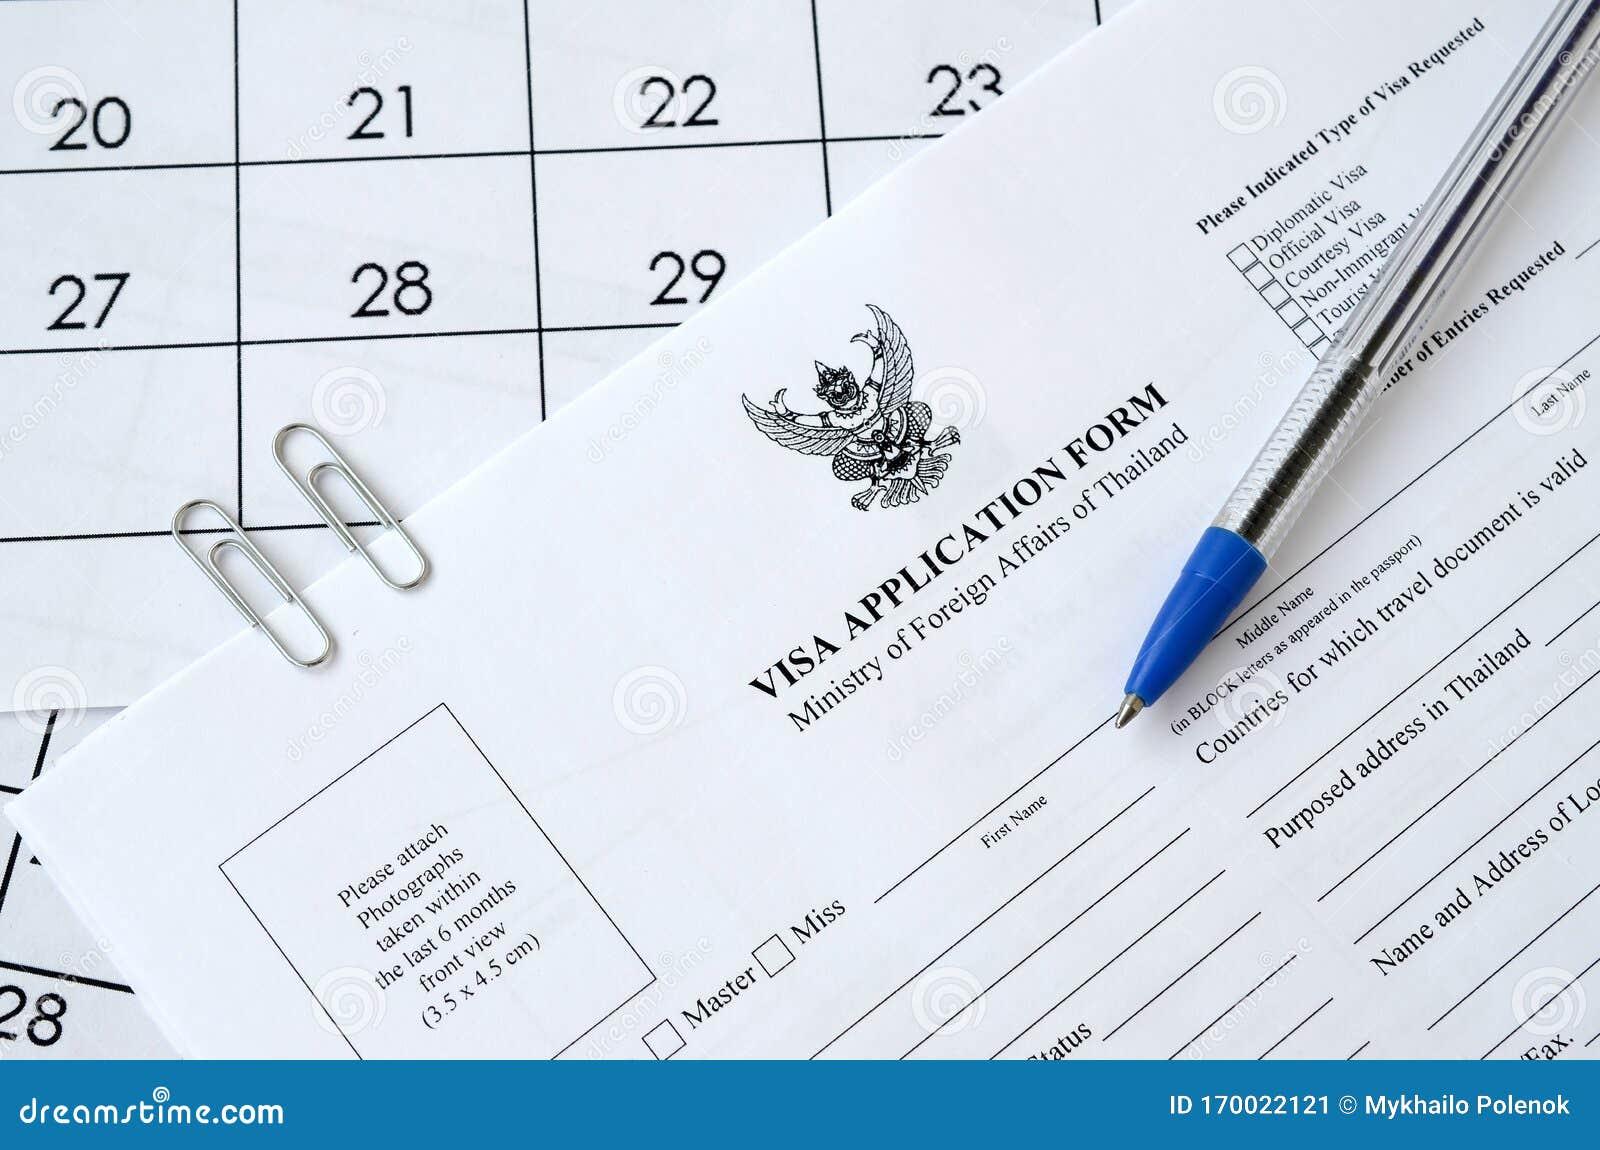 Thailand Visa Application Form And Blue Pen On Paper Calendar Page Editorial Photo Image Of Emigration Form 170022121